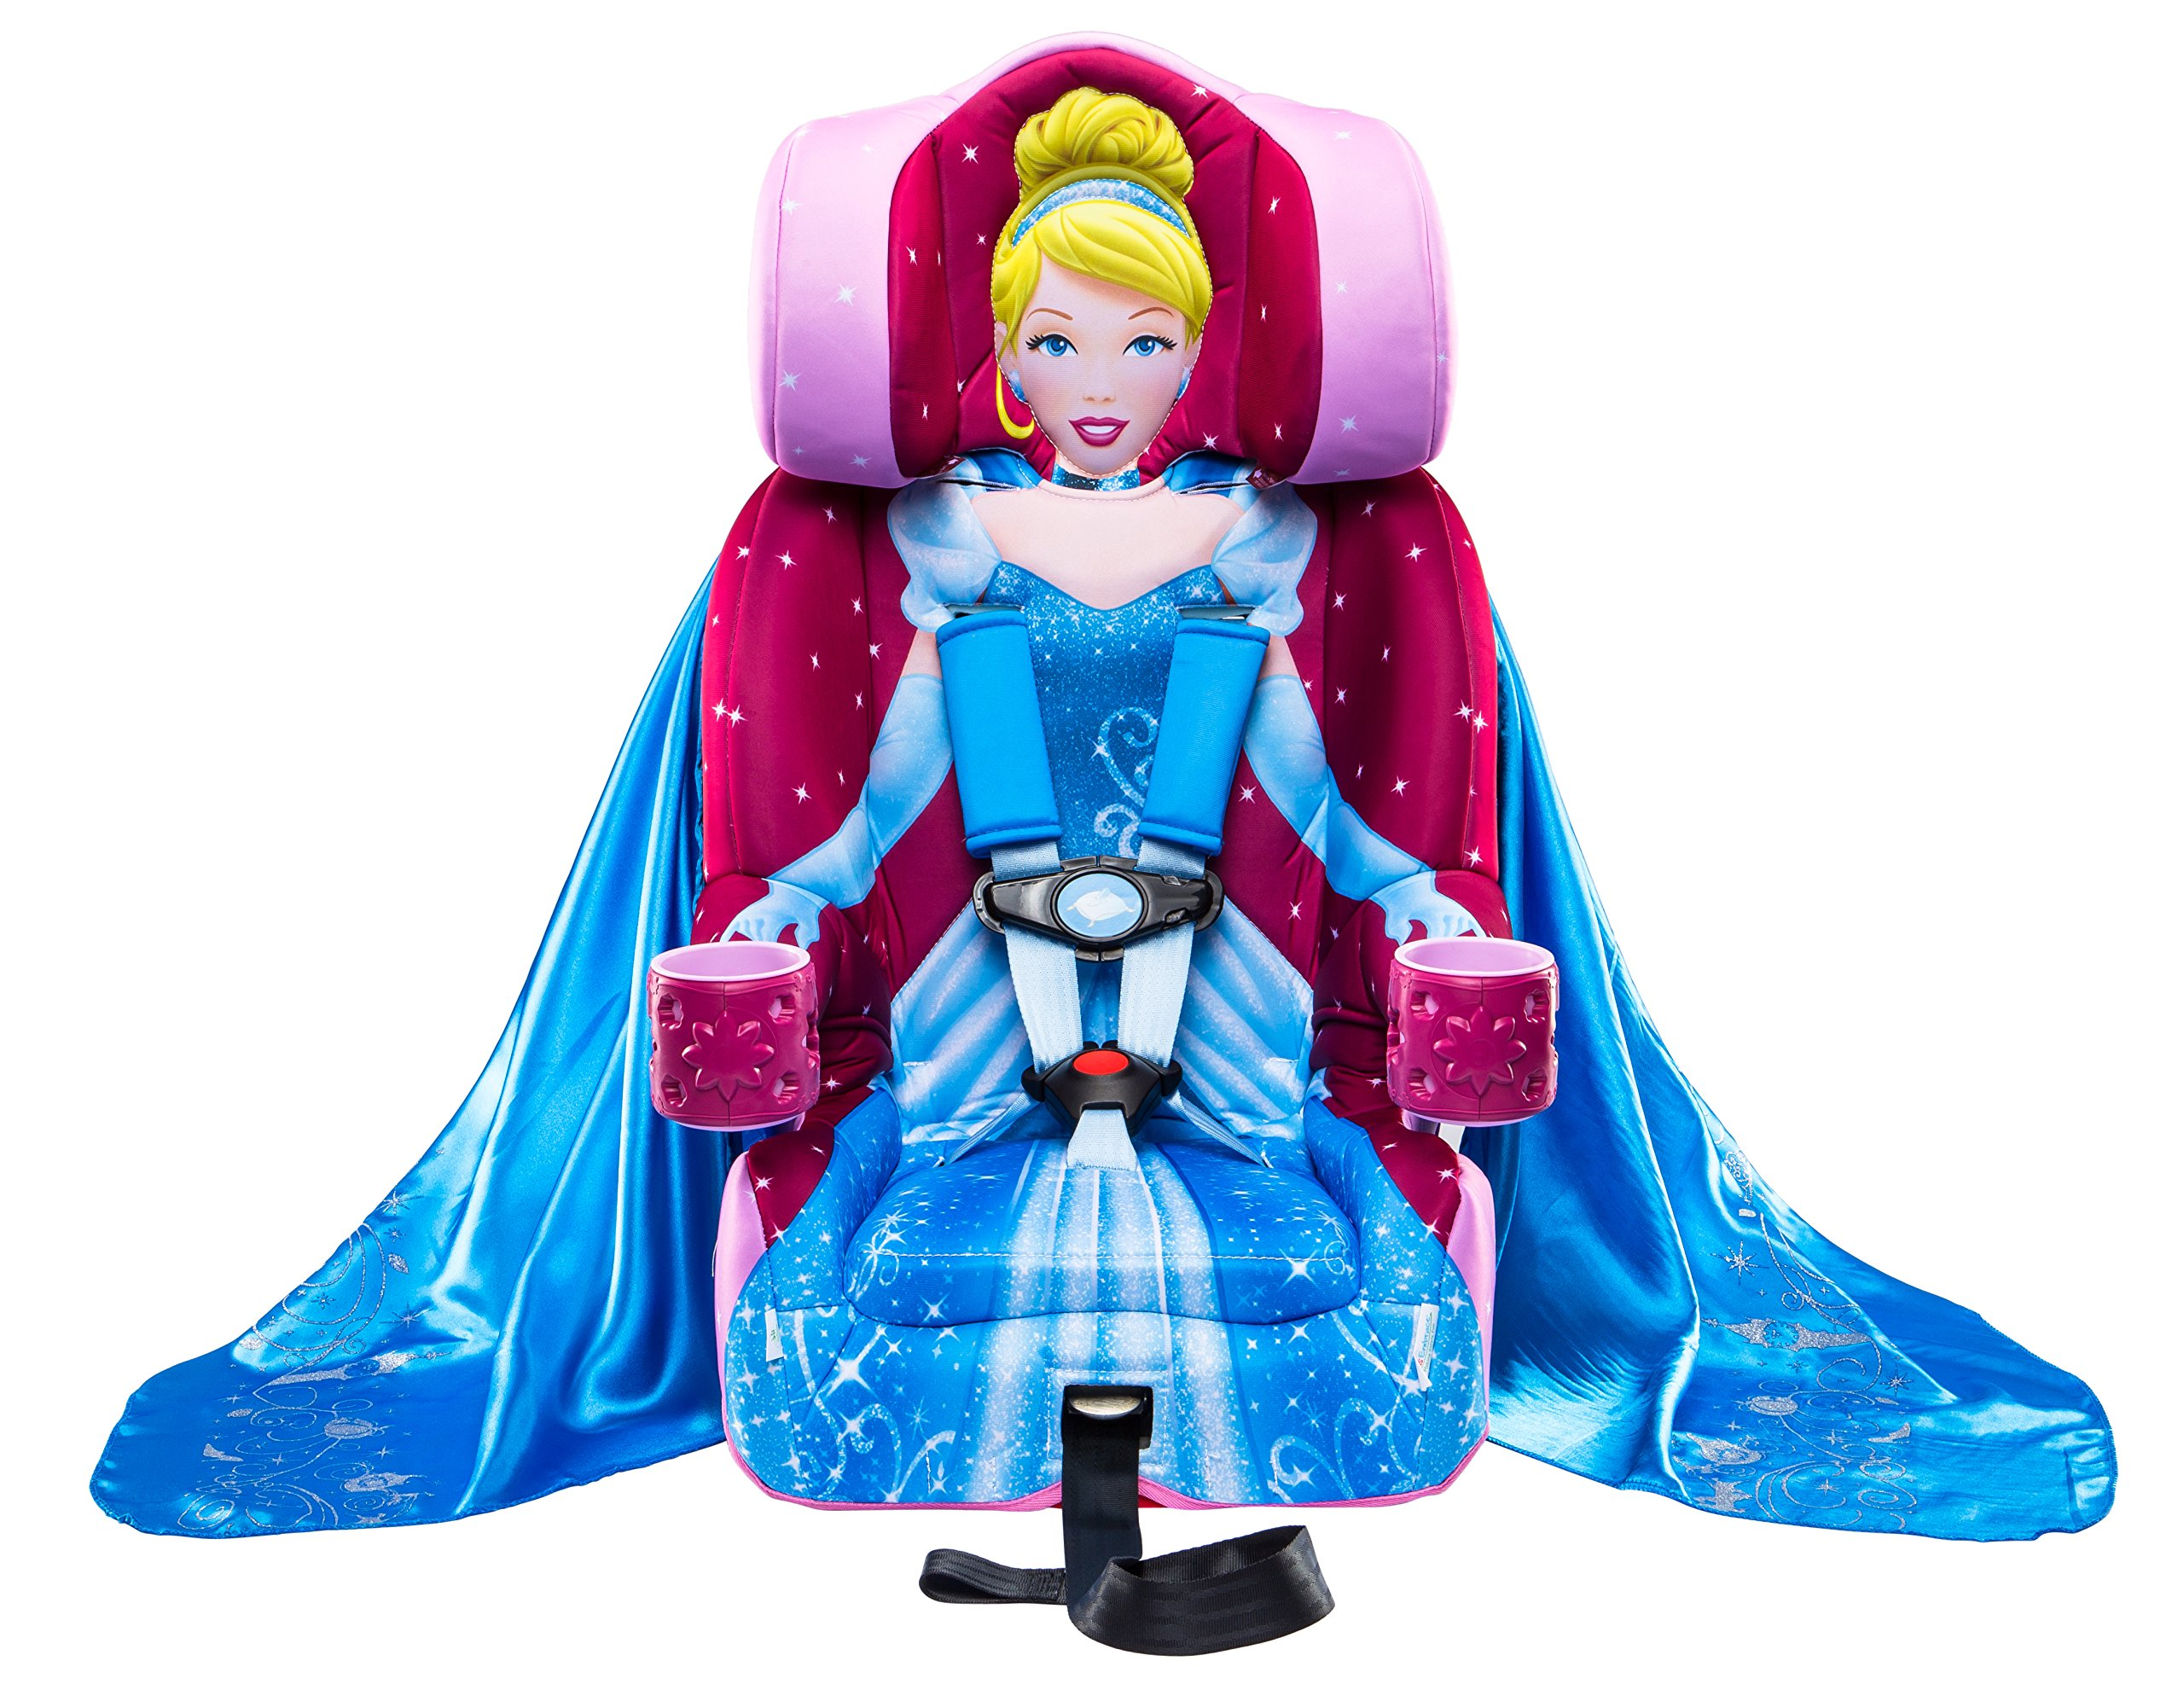 Amazon.com : KidsEmbrace Cinderella Booster Car Seat, Disney ...